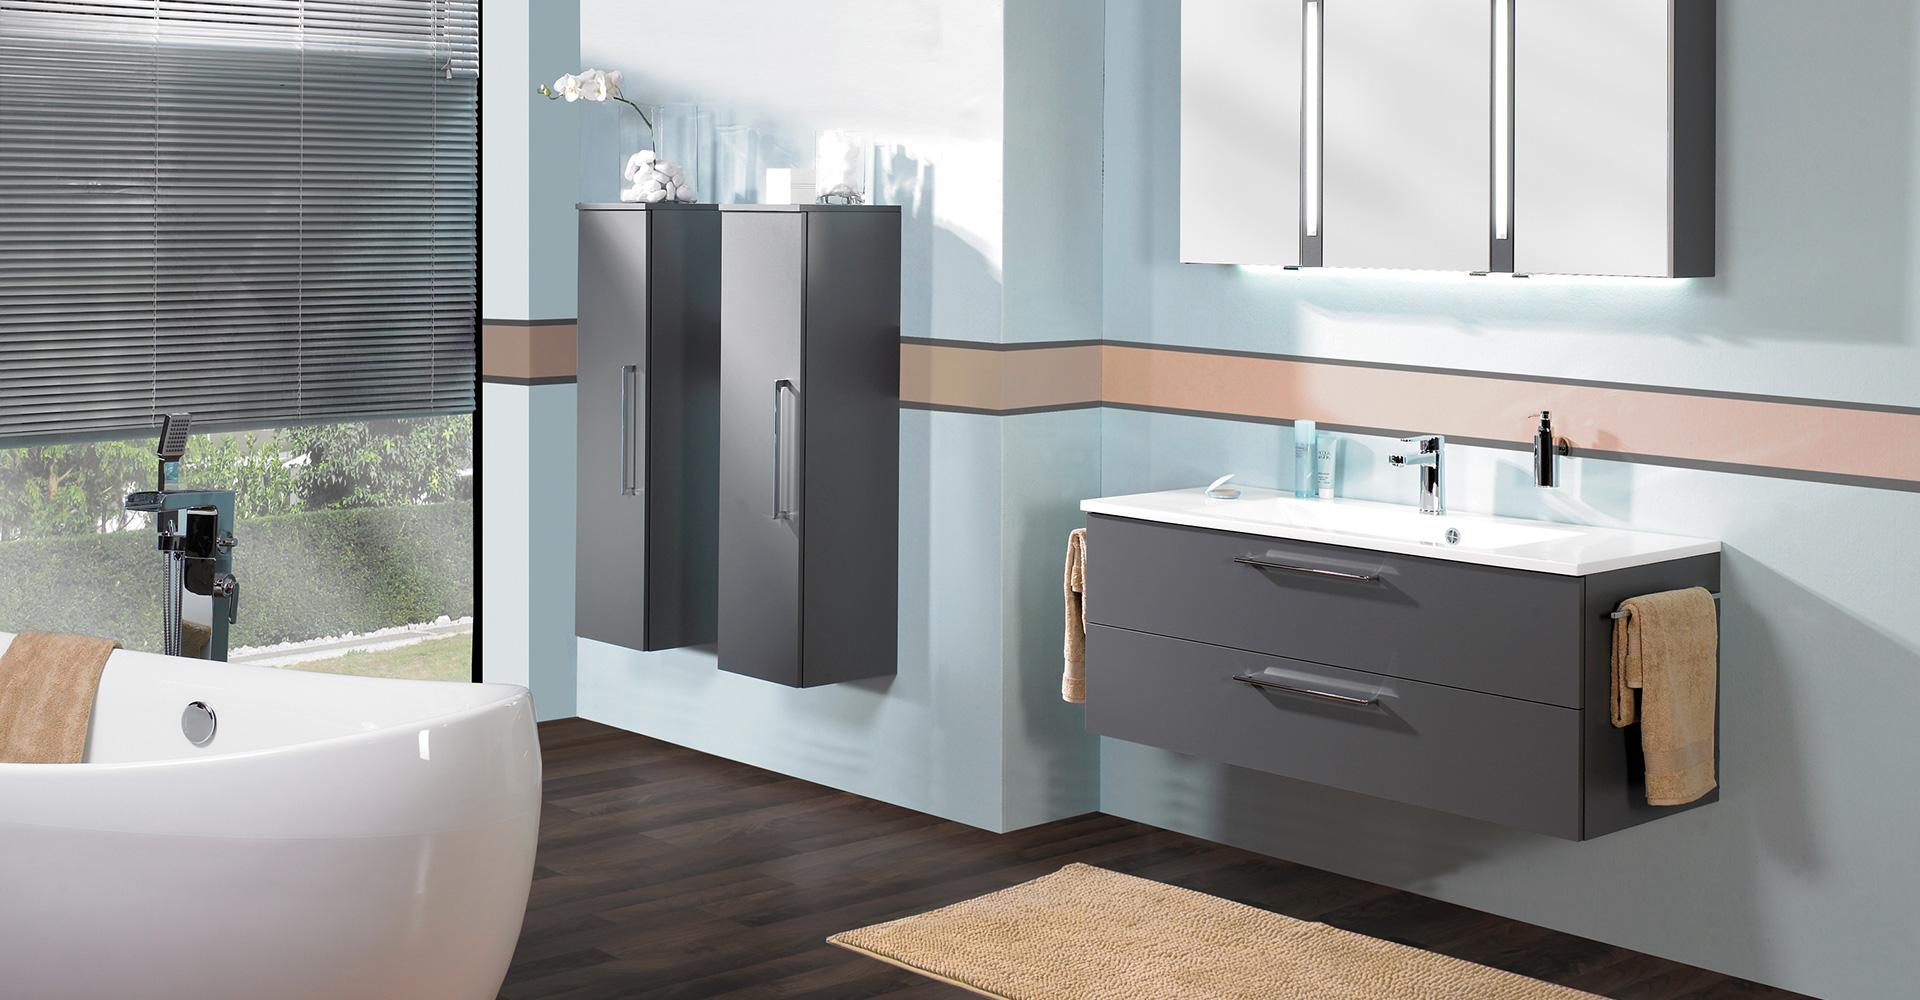 Moderne badkamers design met uitstraling otten keukens sanitair - Moderne design badkamer ...